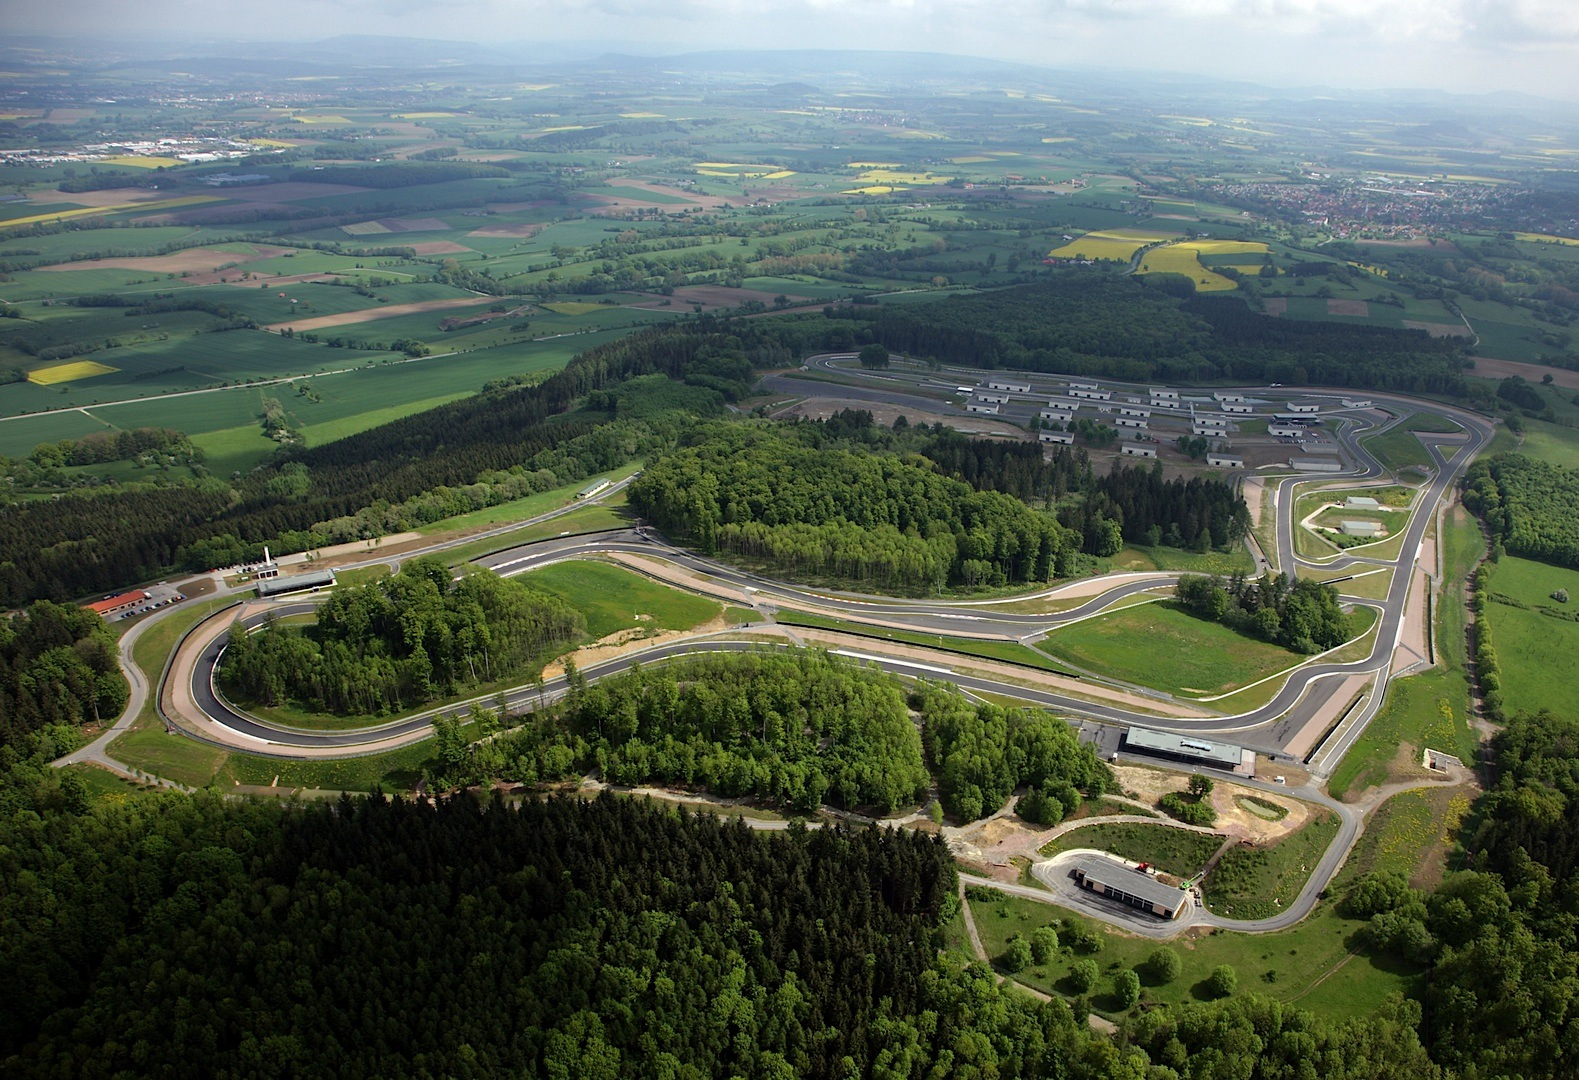 Google Maps Uses Drawn Version Of The Bilster Berg Circuit